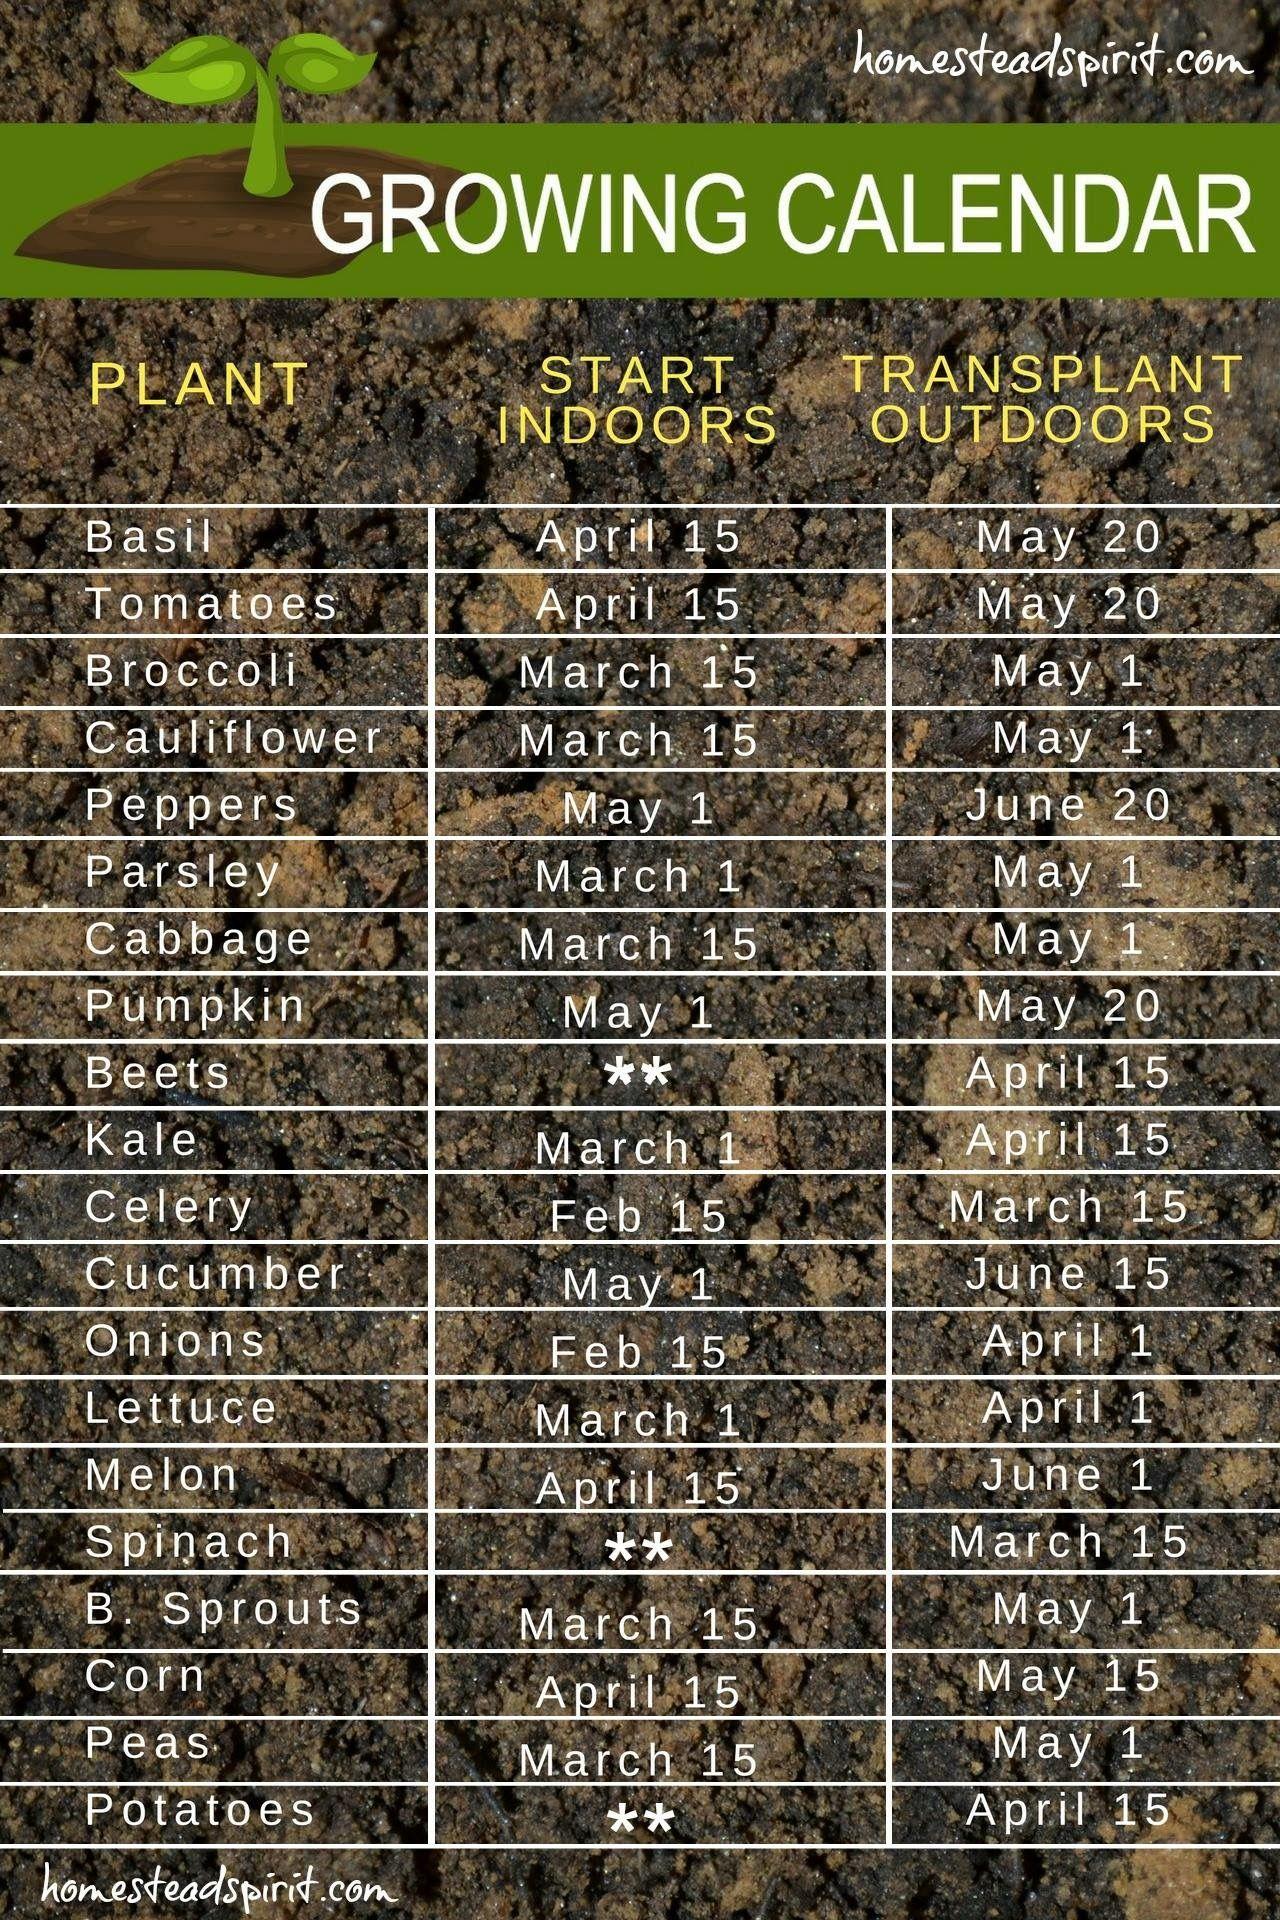 When To Plant Growing Calendar Garden Seeds Starting Seeds